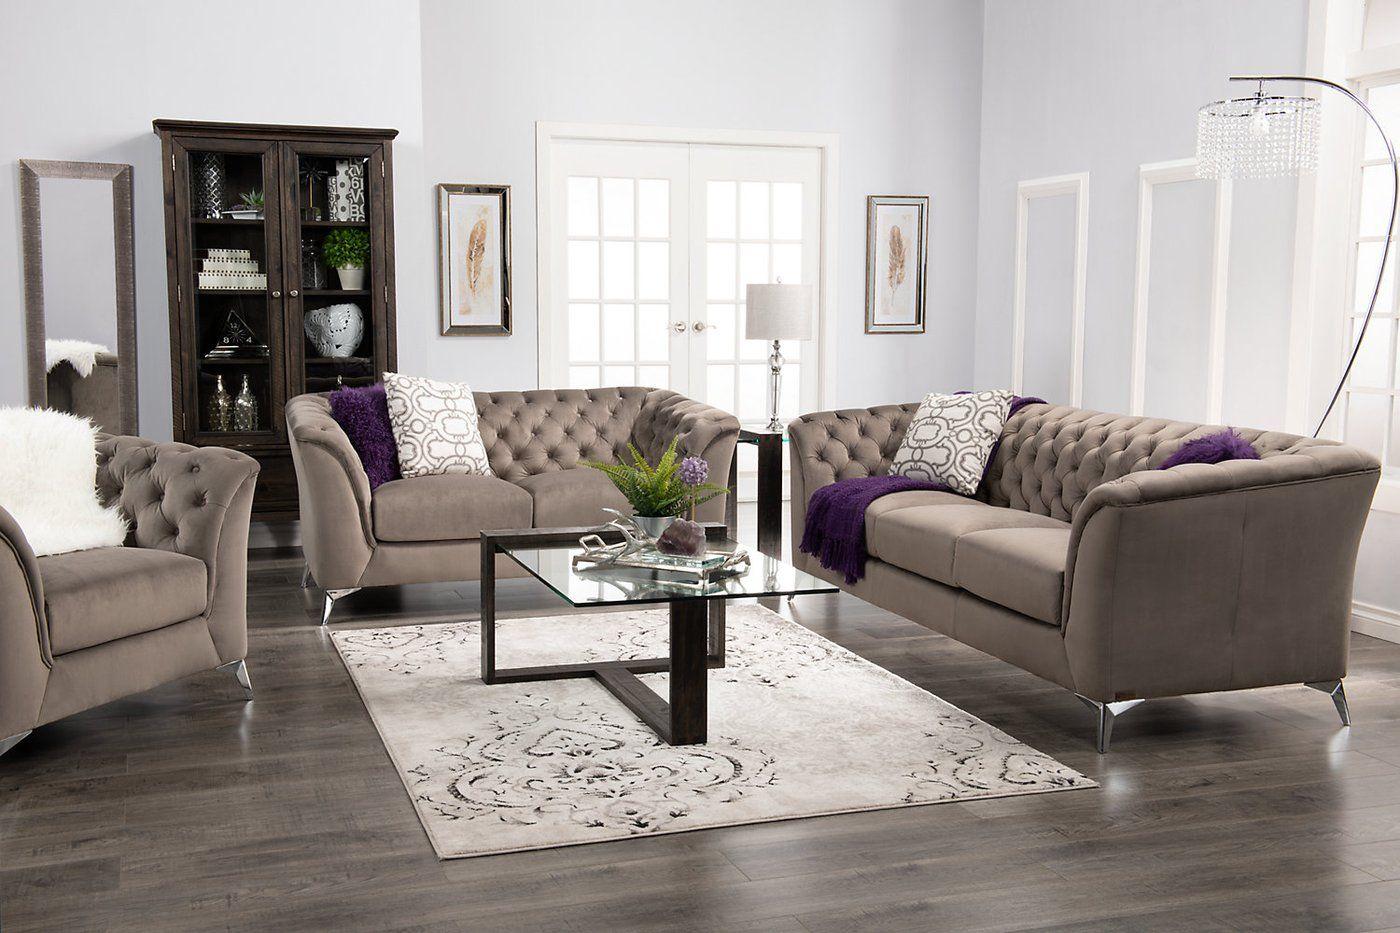 Meredith Velvet Fabric Sofa – Grey  The Brick  Grey fabric sofa